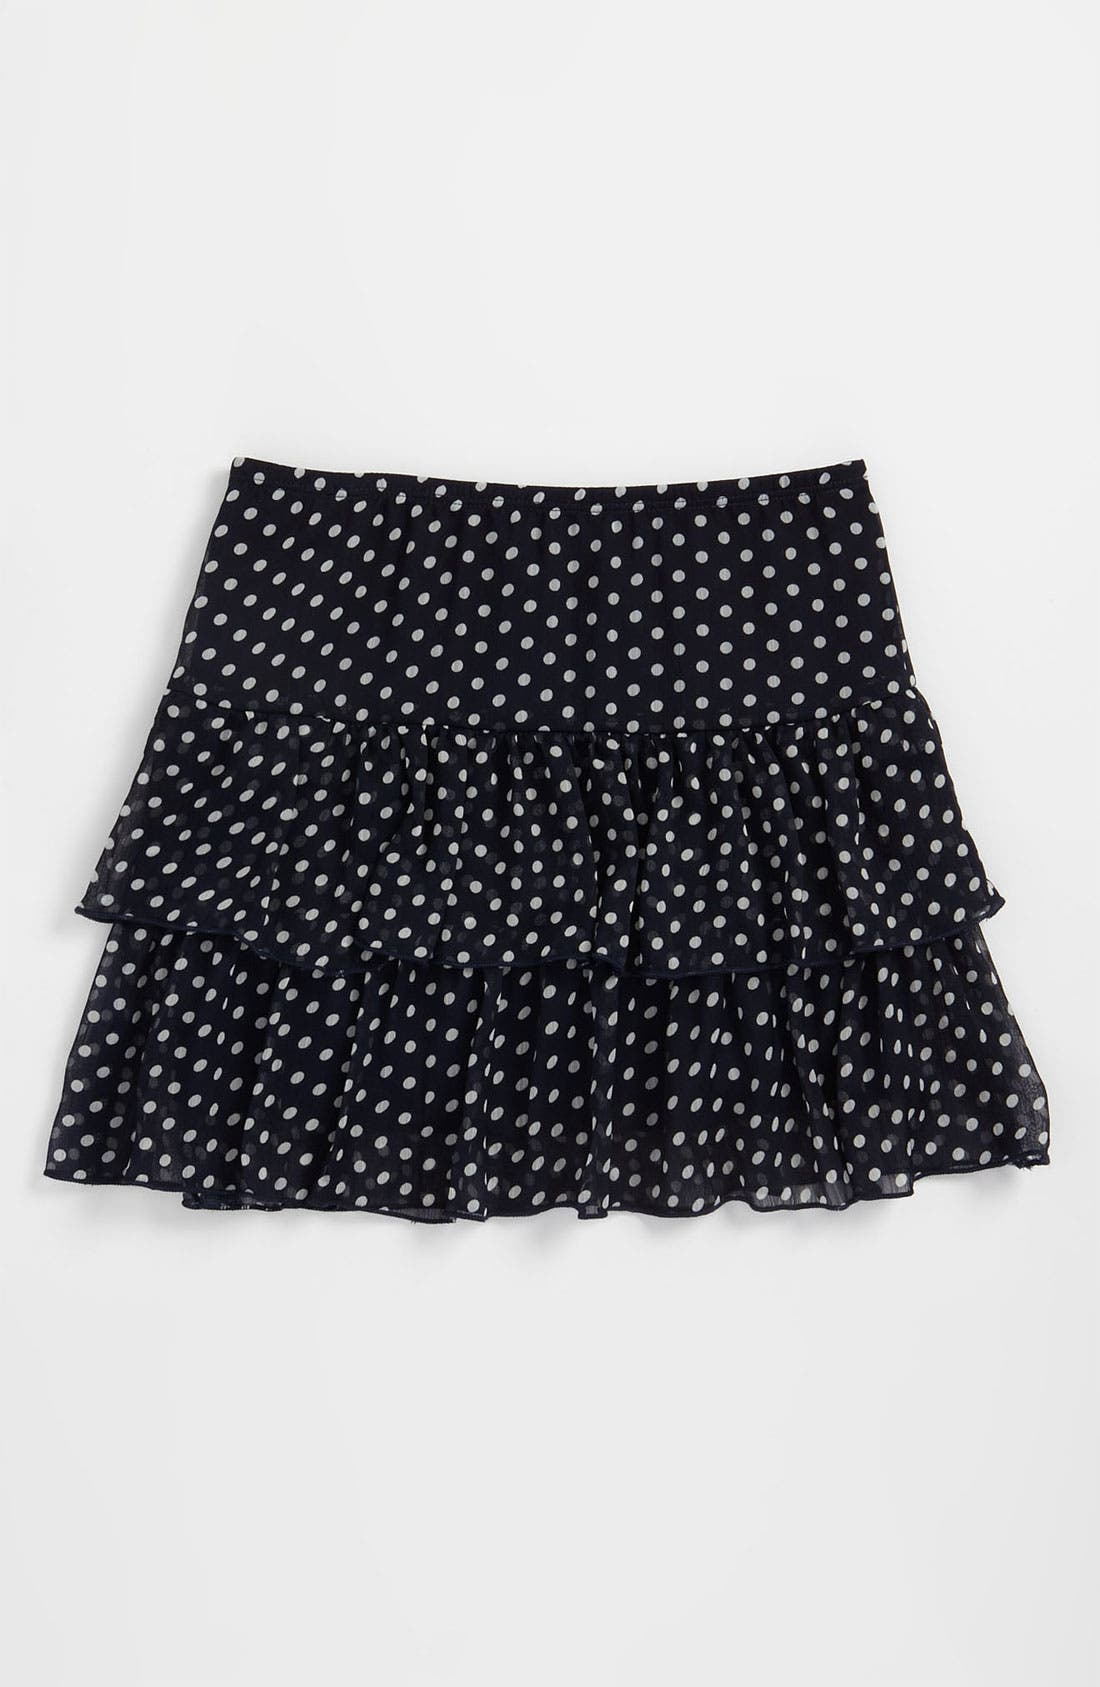 Alternate Image 1 Selected - Zunie Chiffon Skirt (Big Girls)